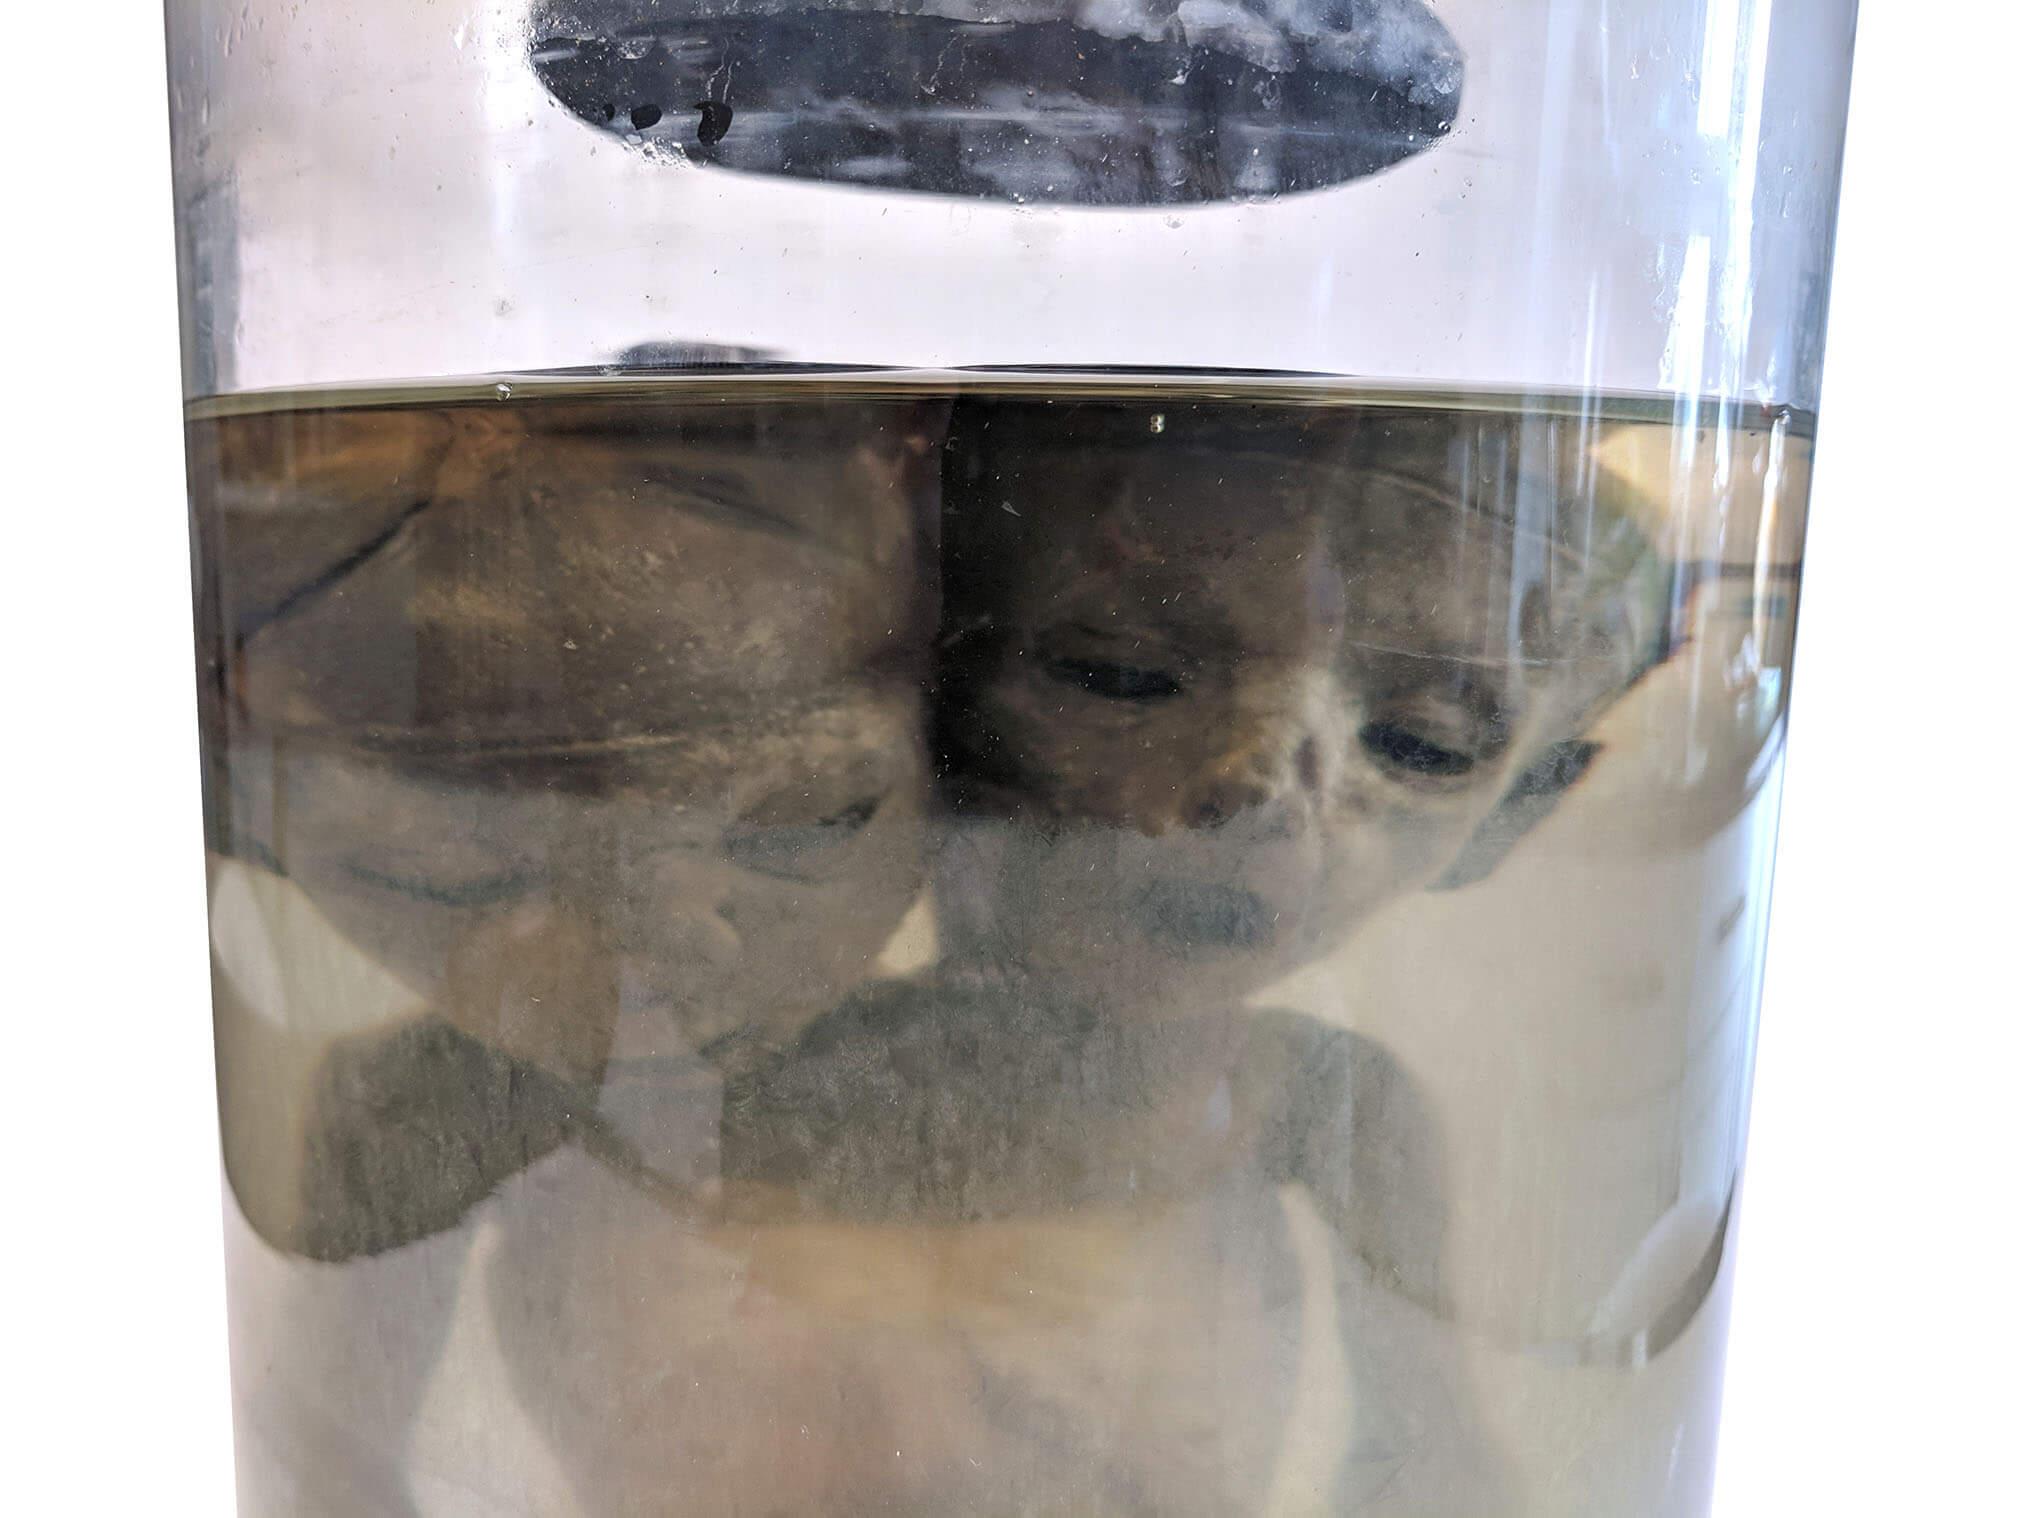 Two-headed baby (2).jpg